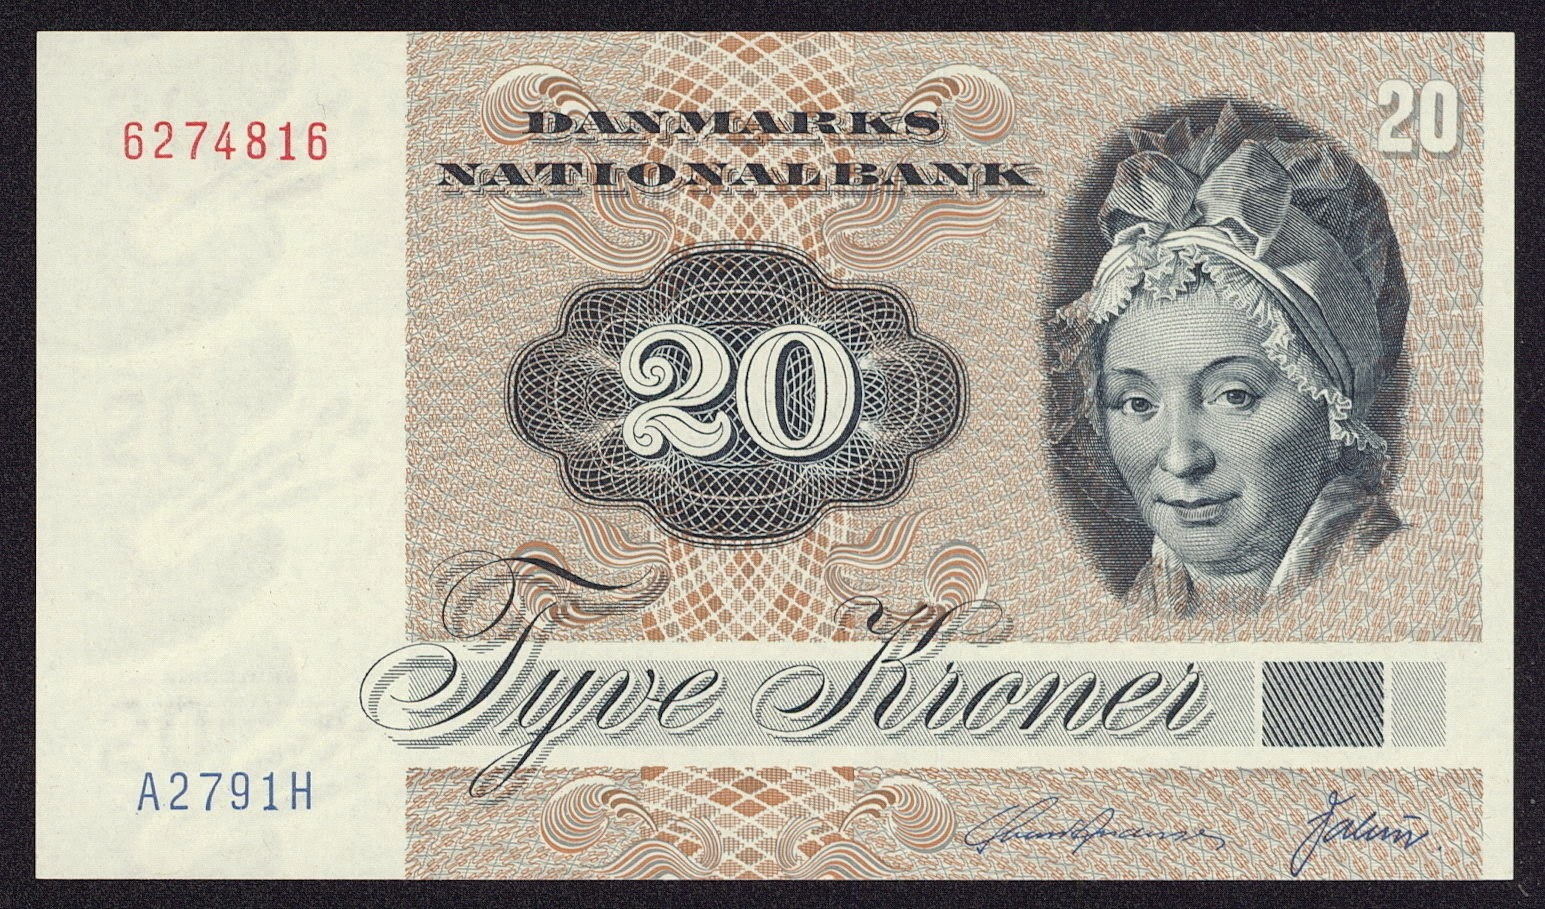 Banknotes of Denmark 20 krone banknote 1972 Pauline Tutein